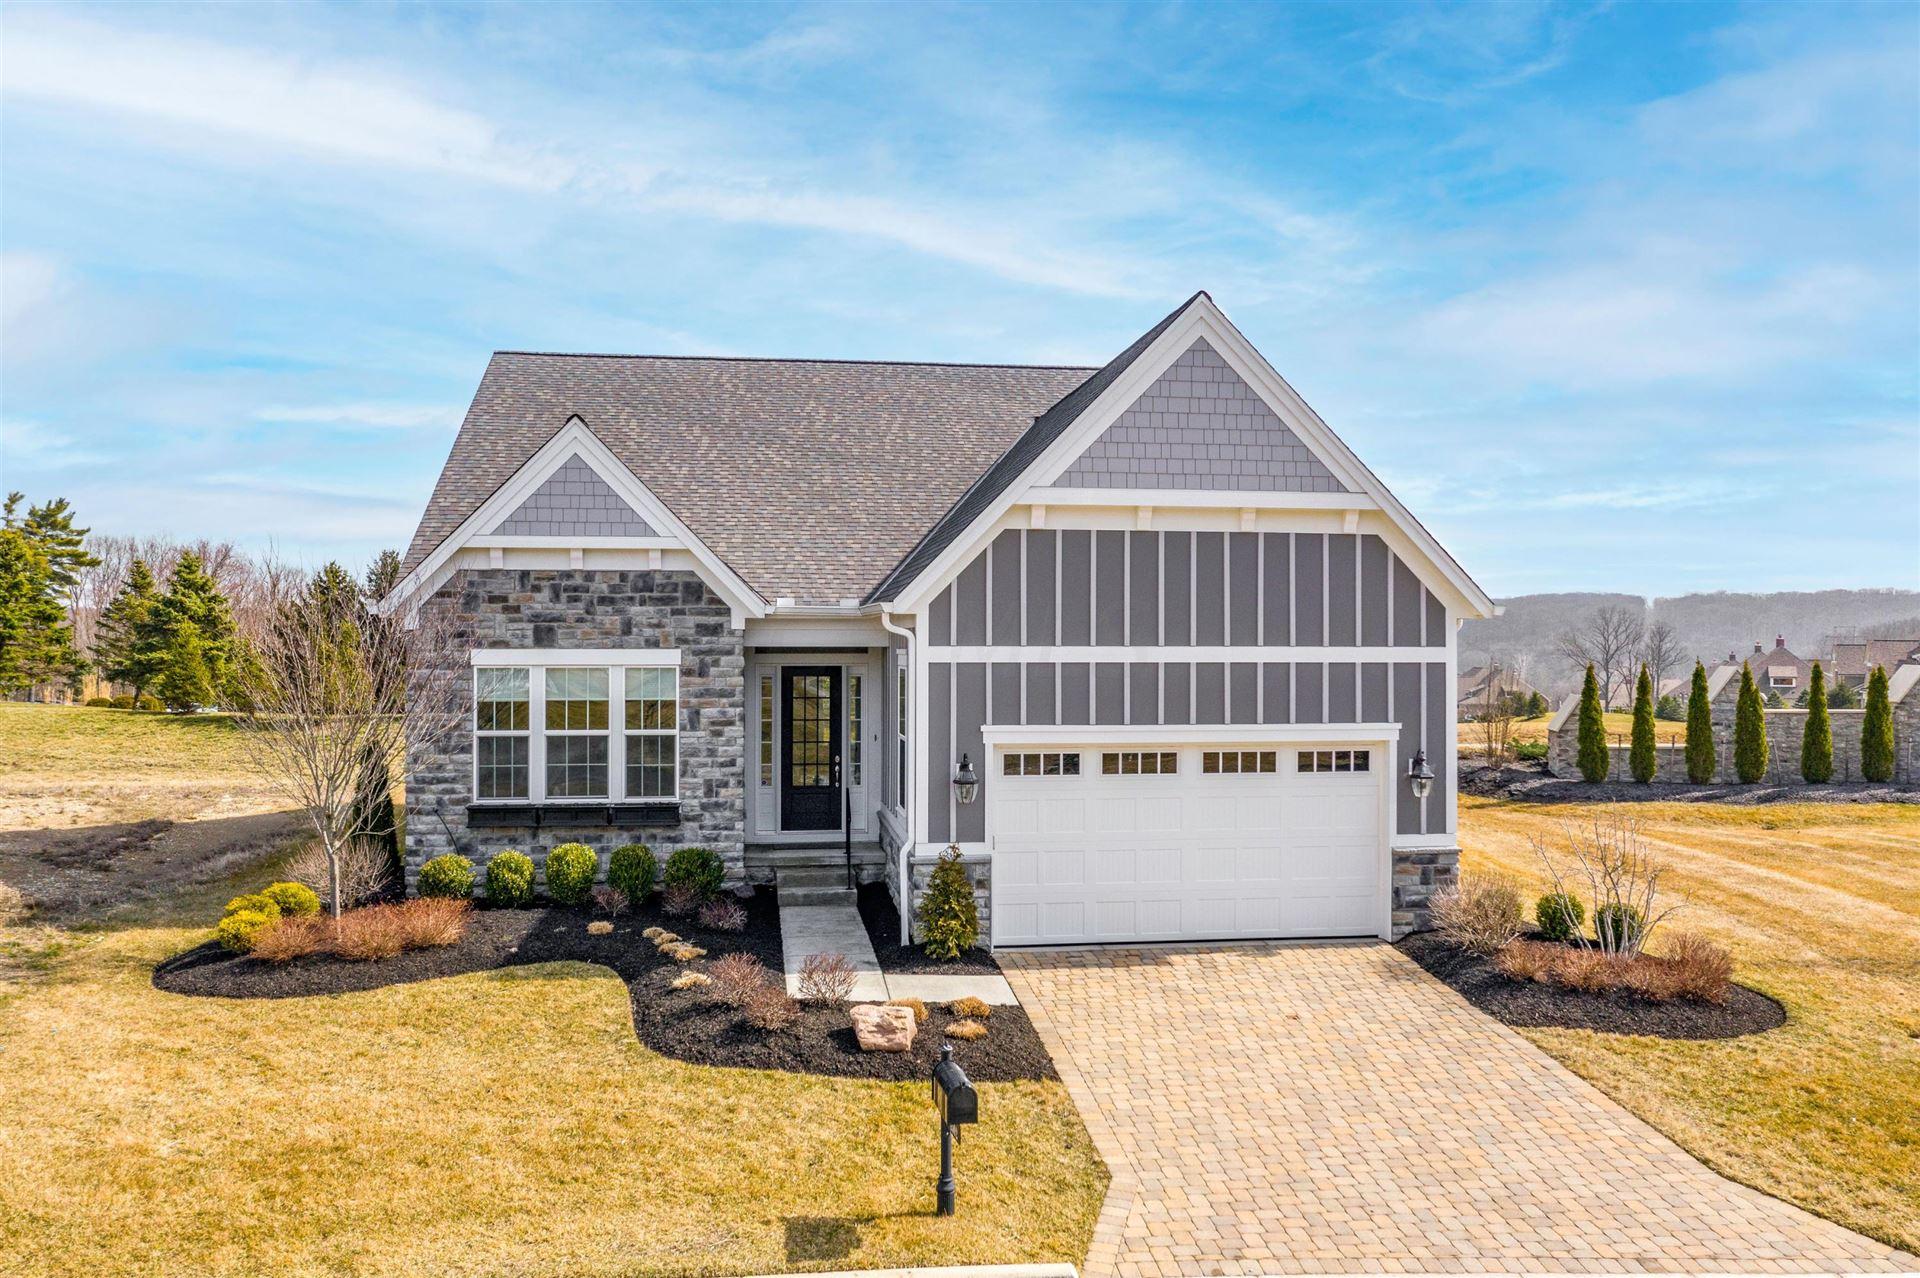 1502 Villa Way, Powell, OH 43065 - MLS#: 221008330